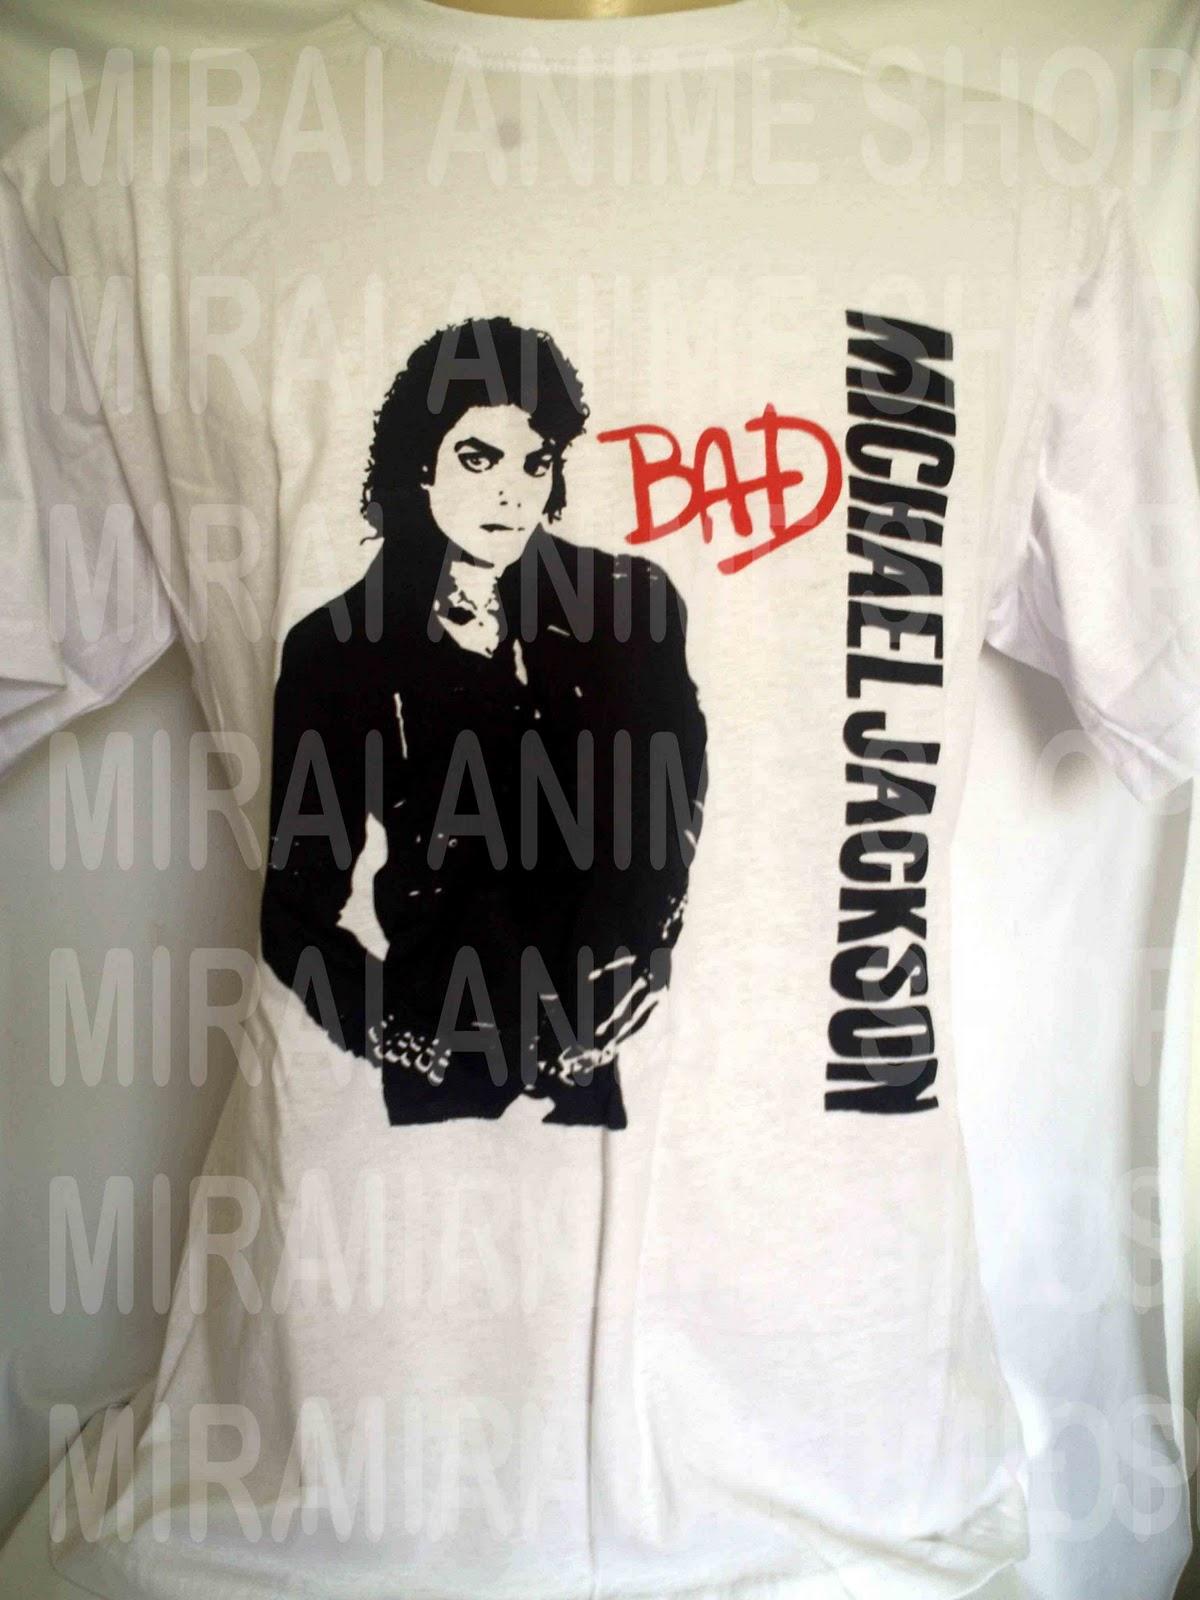 http://2.bp.blogspot.com/_jQVlK6NRoLA/TSshdHYcMqI/AAAAAAAAAe8/BavDPPYvr_k/s1600/michael_jackson_t-shirt.jpg